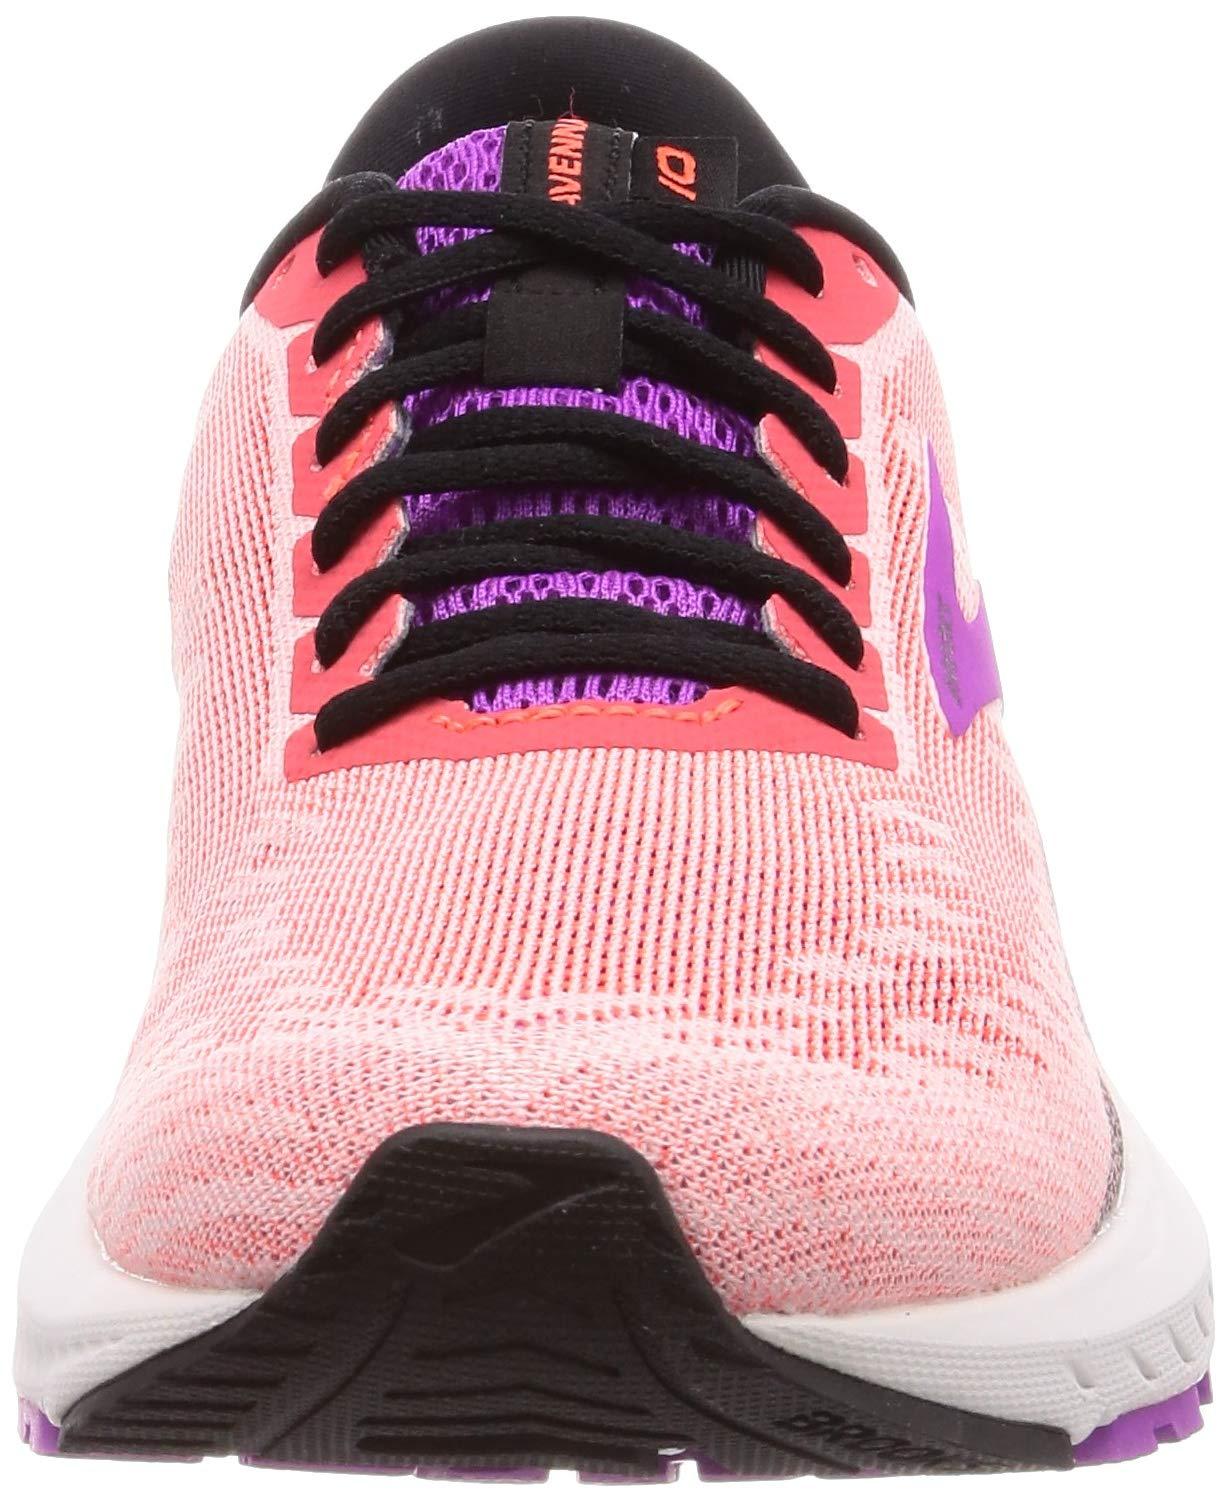 63a3f6658 Brooks Women's Ravenna 10 Running Shoes - UKsportsOutdoors